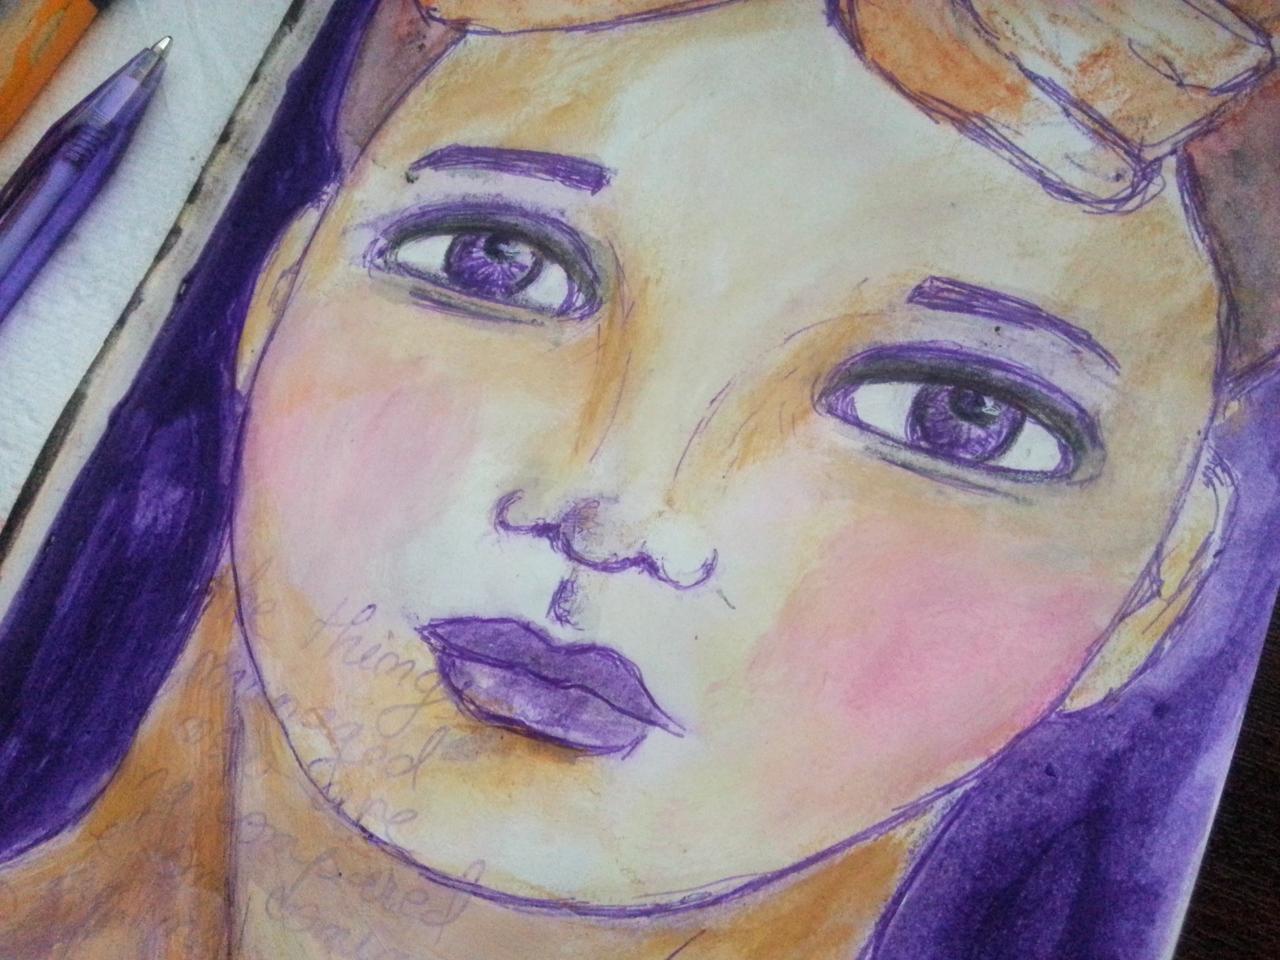 Purple pen face sketch by Cristina Parus @ creativemag.ro